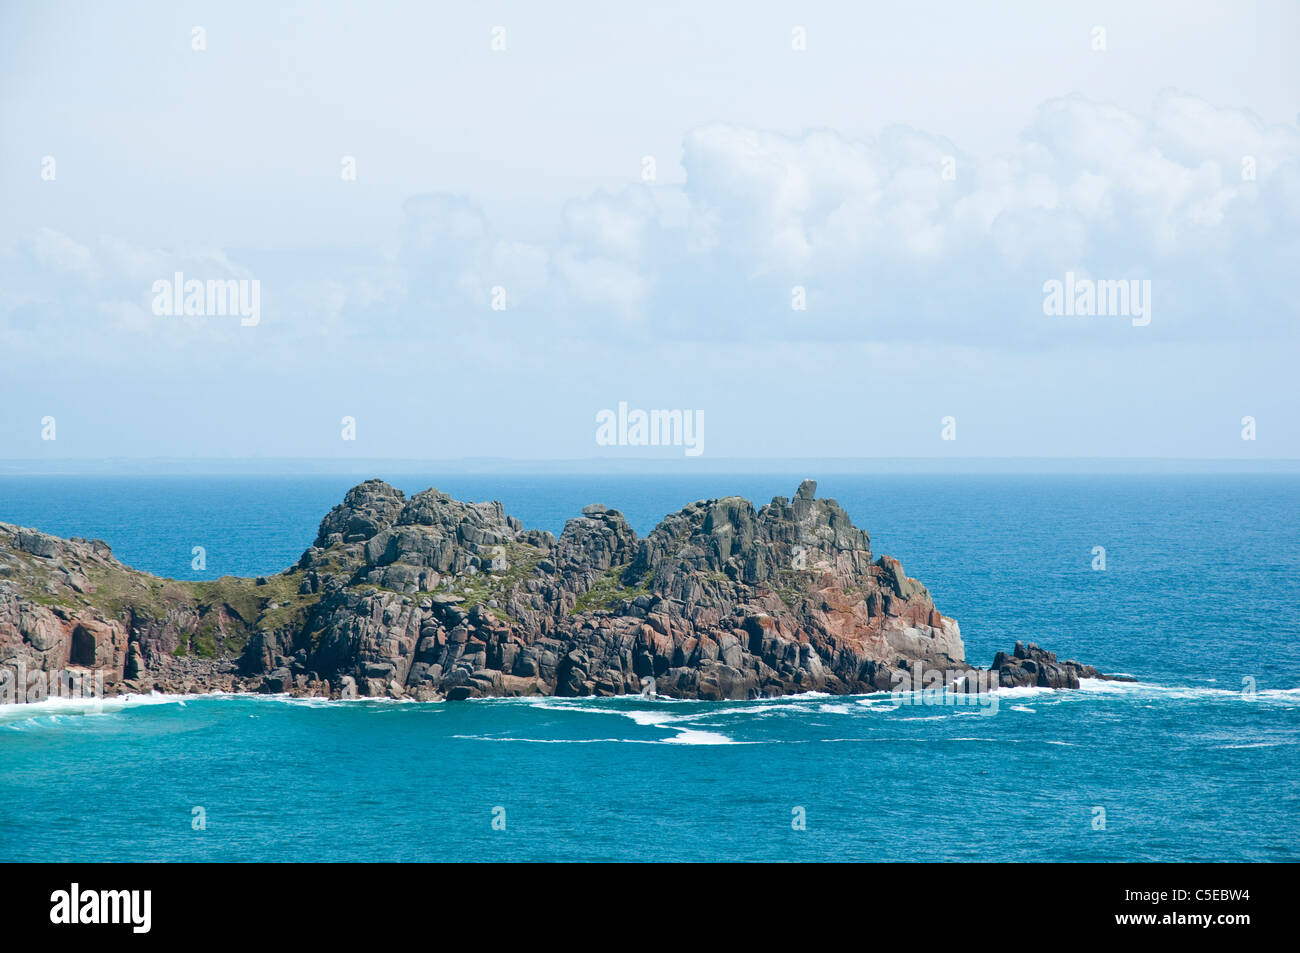 Logan Rock, Porthcurno, Cornwall - viewed from the SWC  path ( SW  Coast / Coastal footpath ). UK. - Stock Image